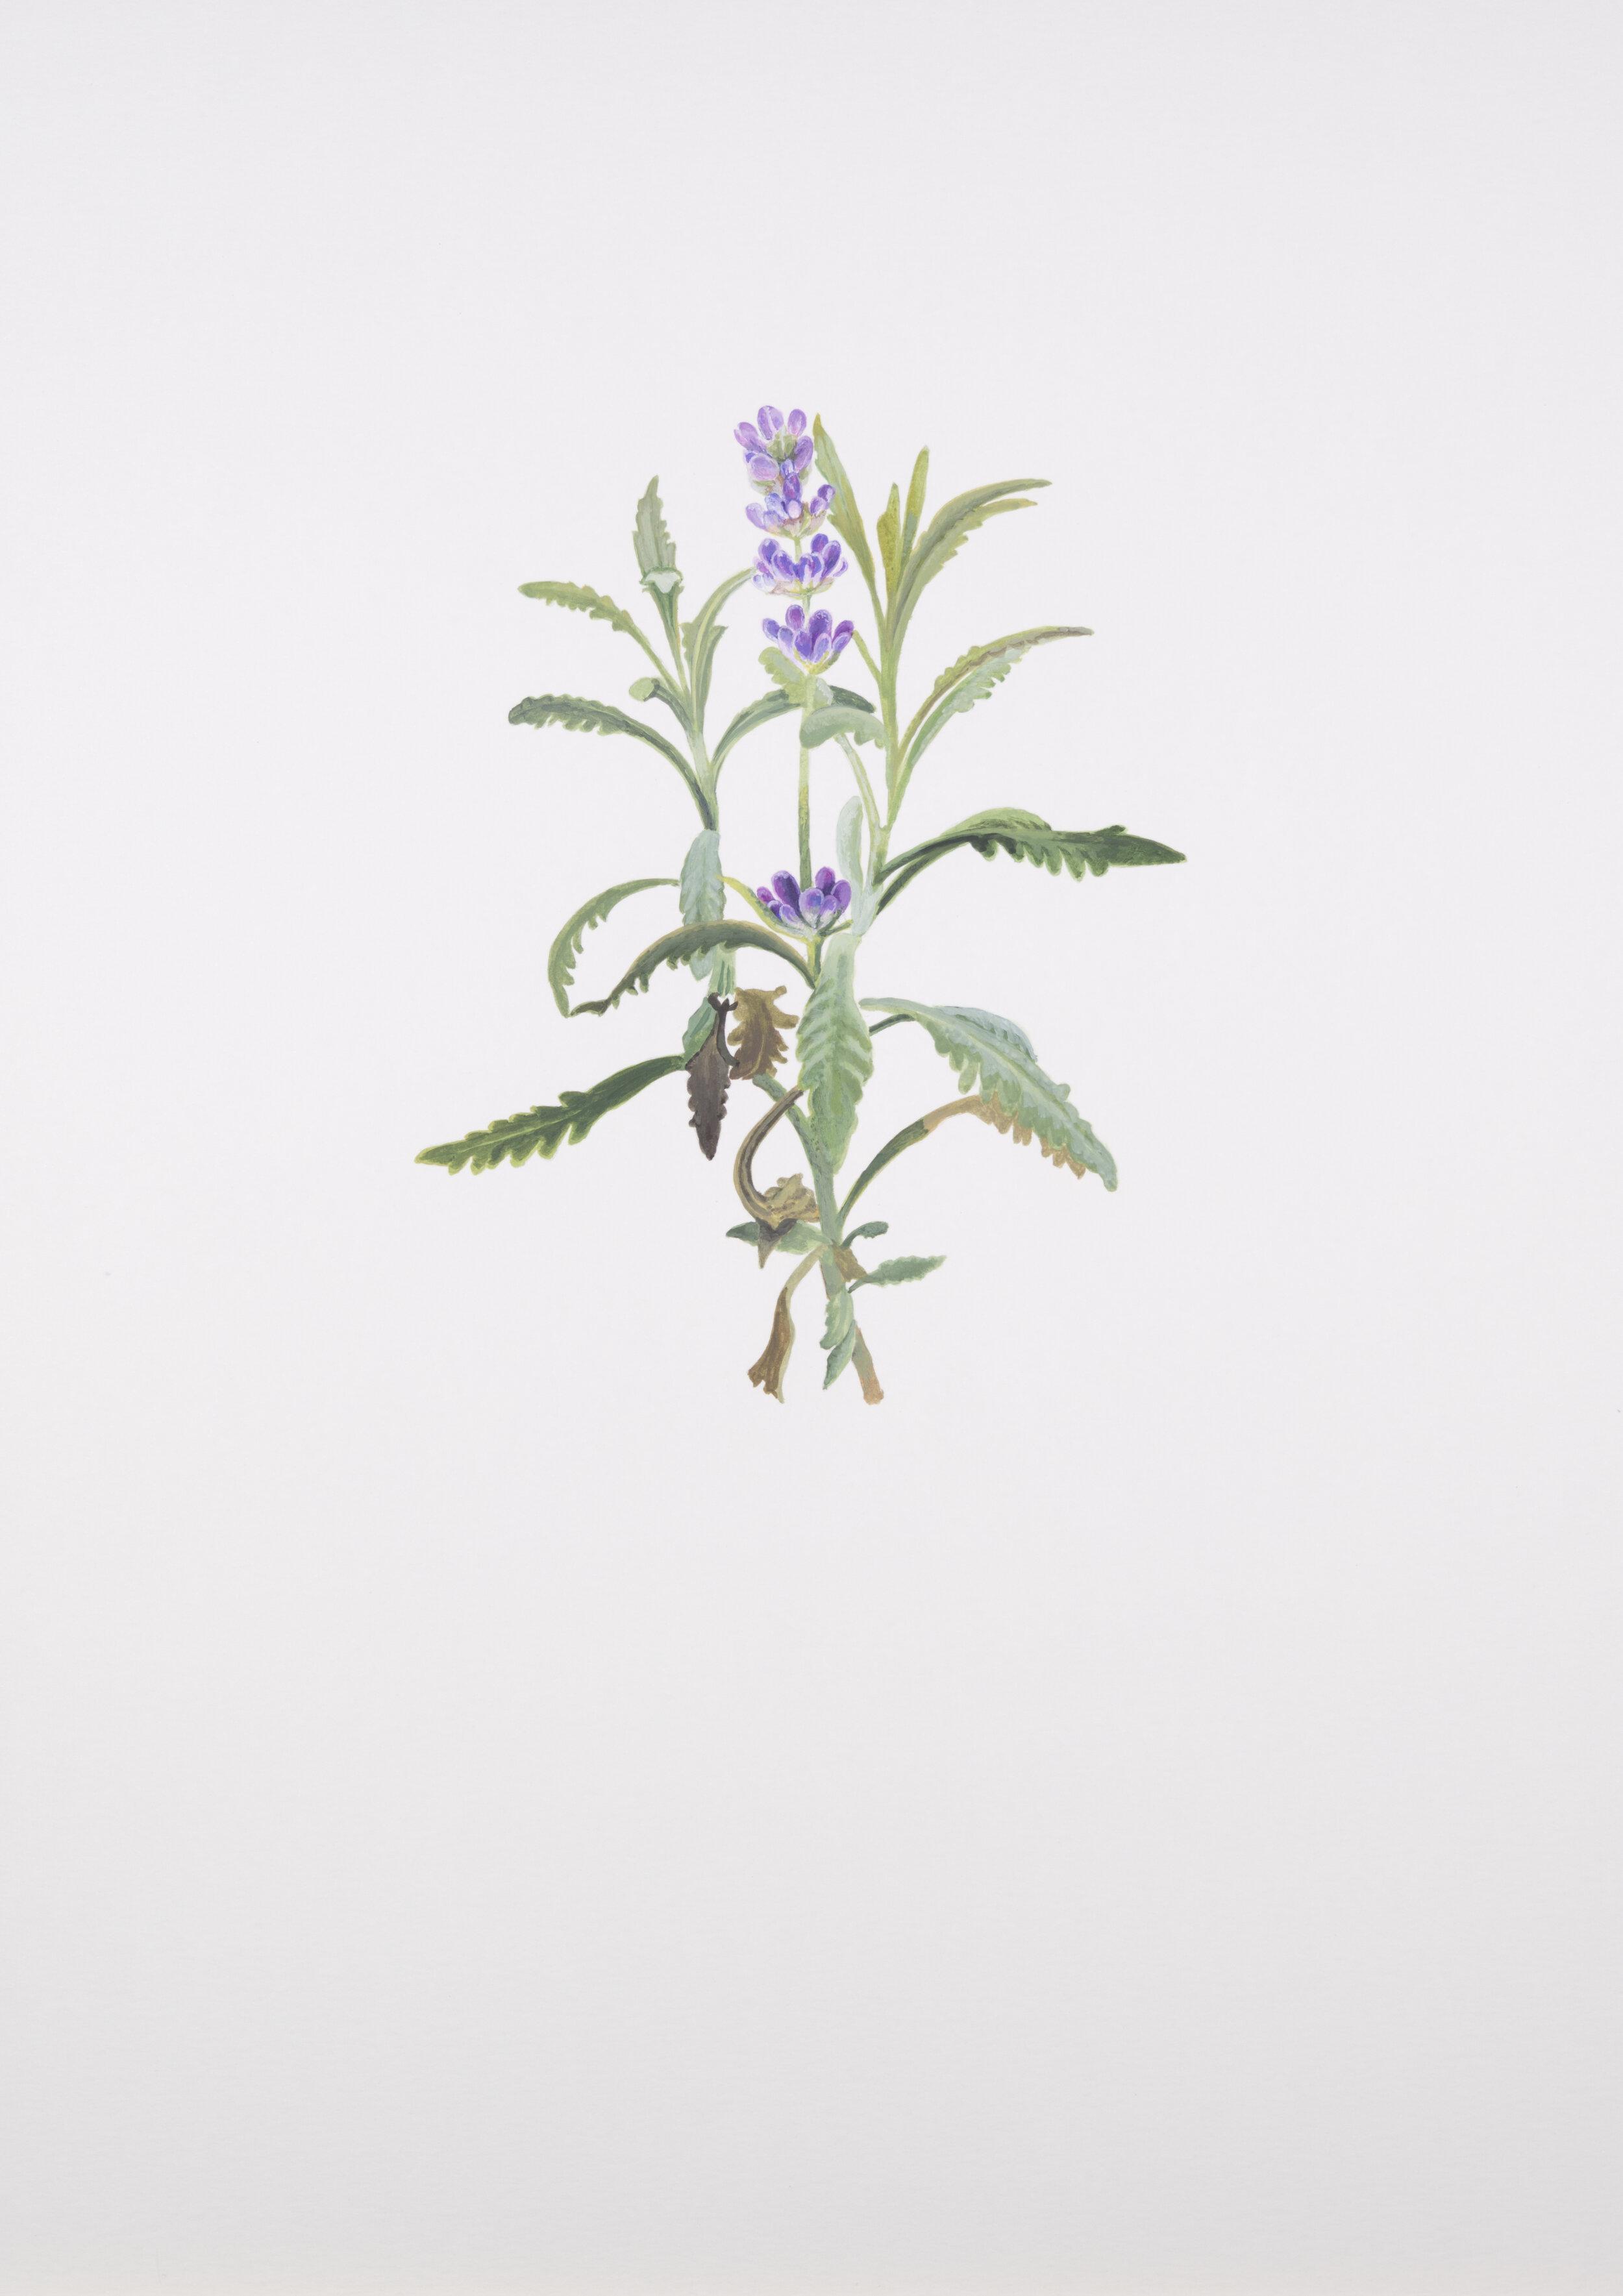 National Flower Of Portugal : national, flower, portugal, Works, Maryam